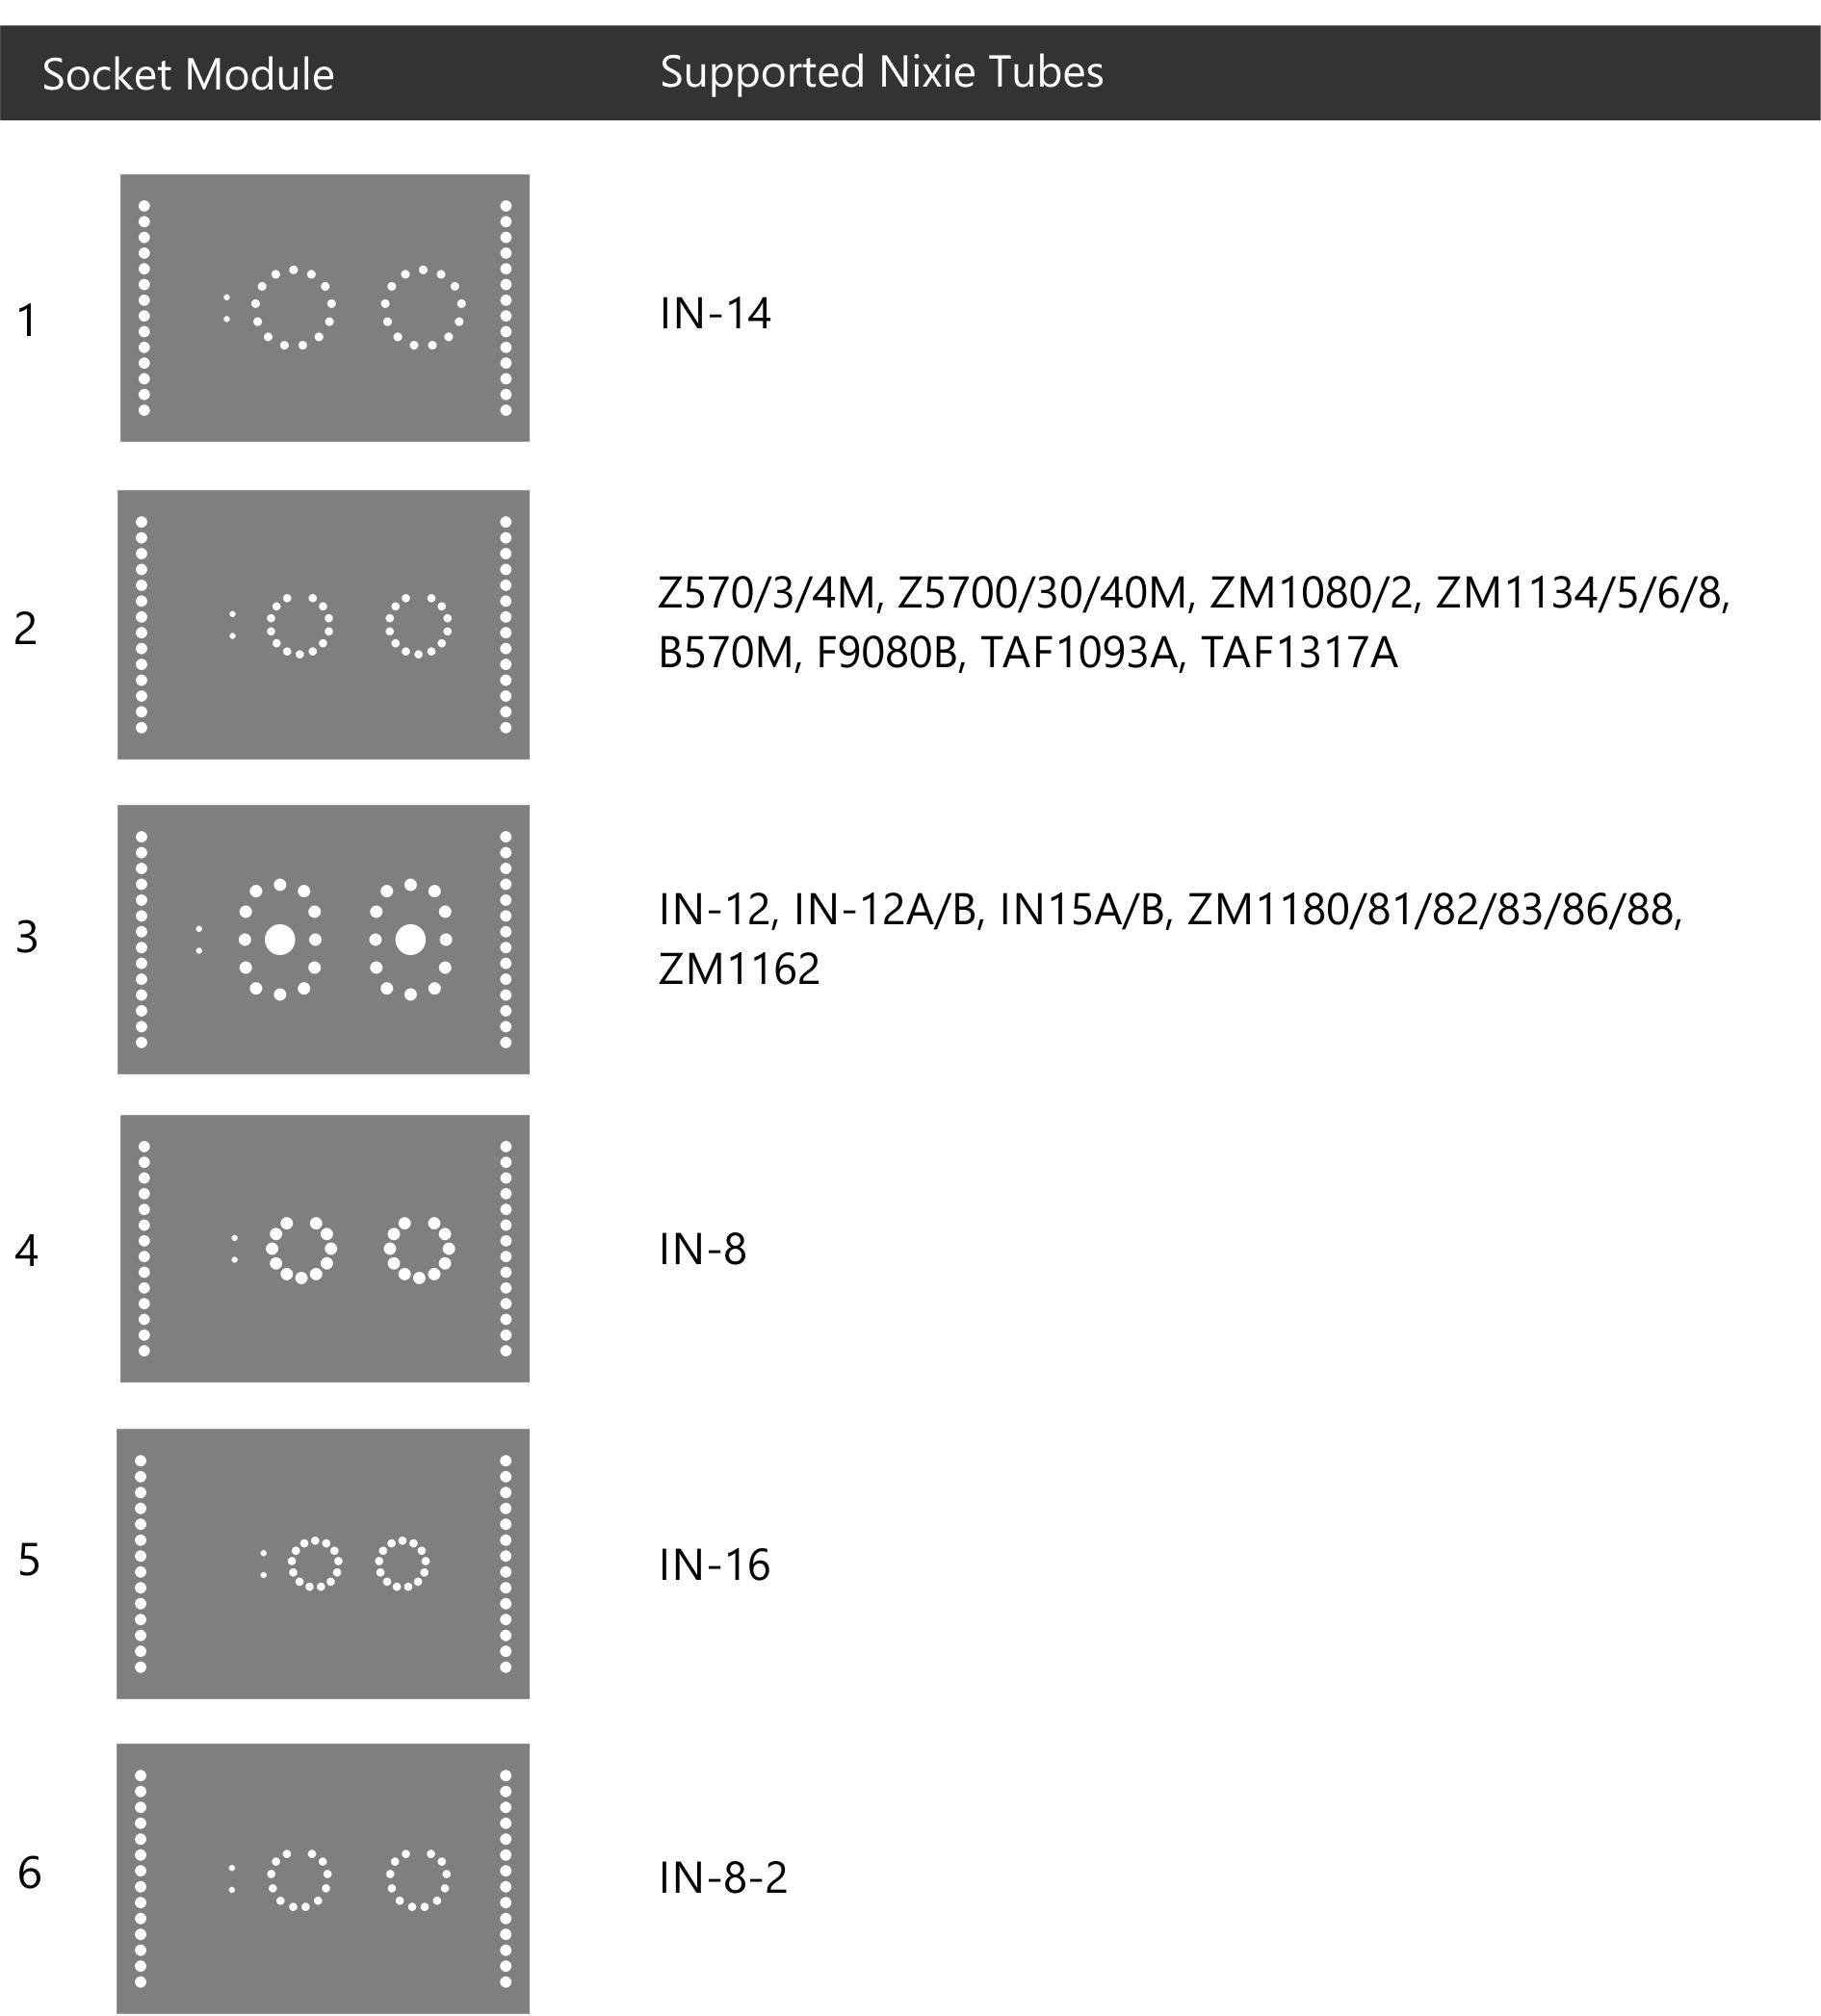 List of Socket Modules